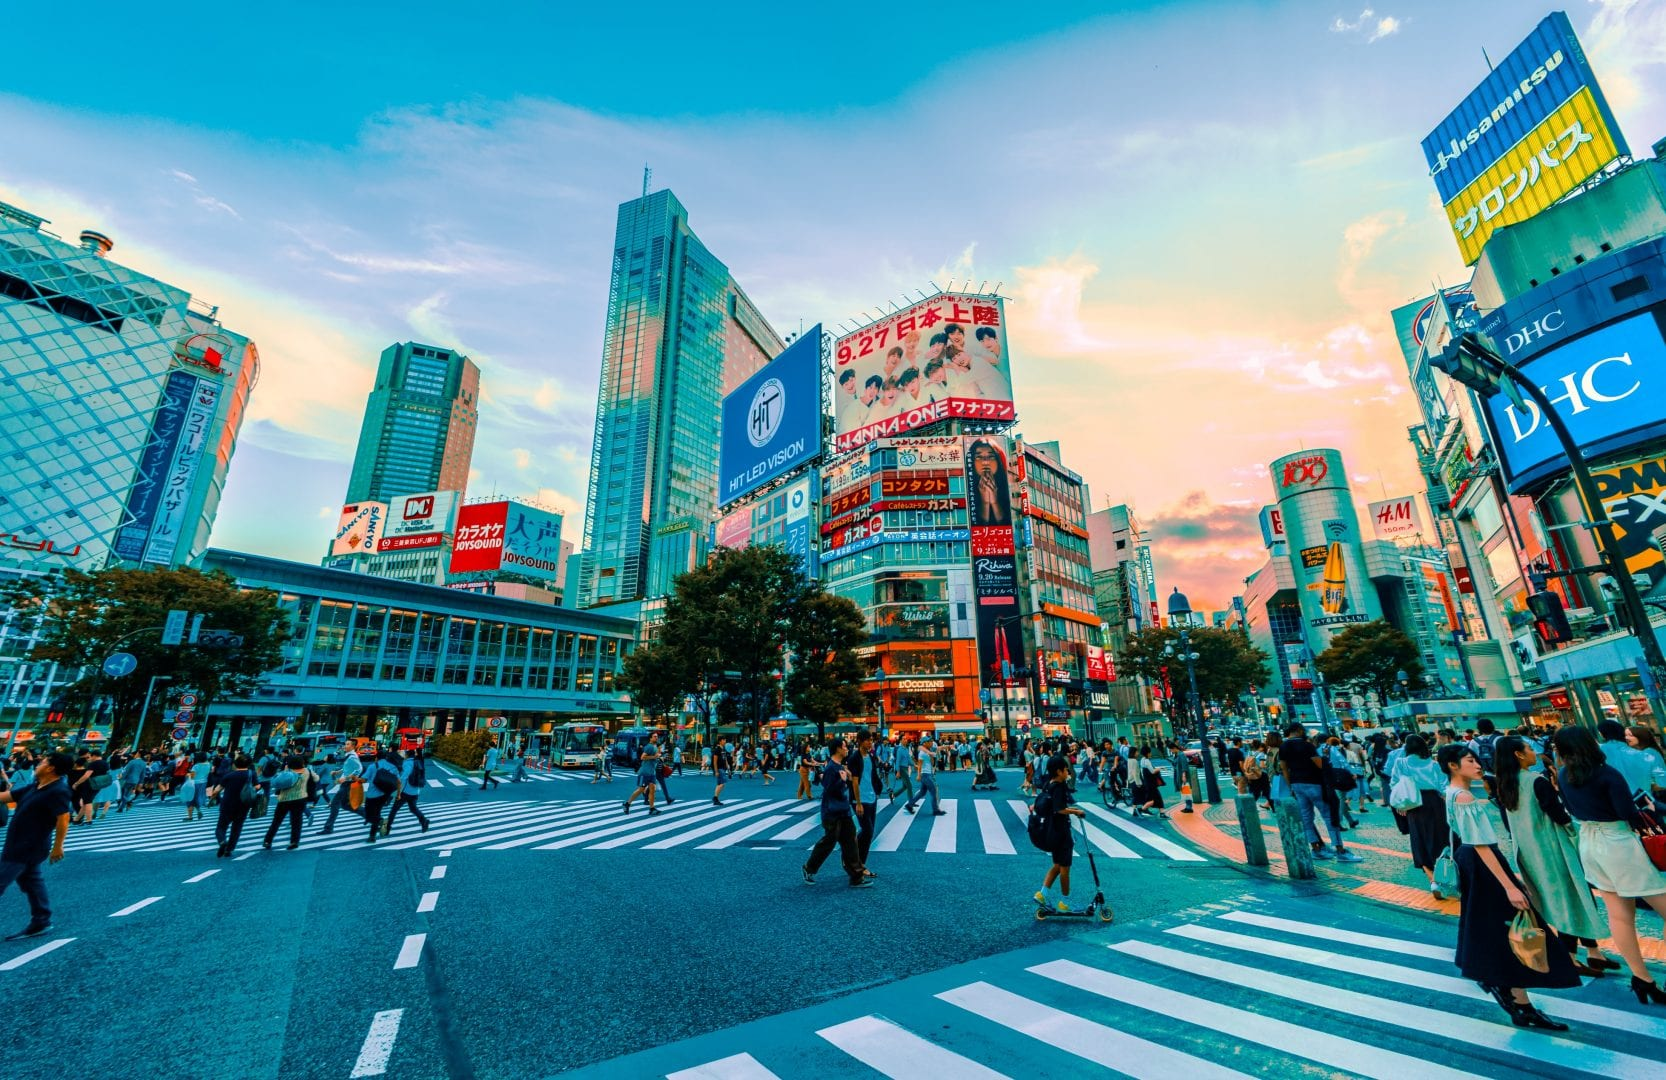 busy tokyo street with pedestrians